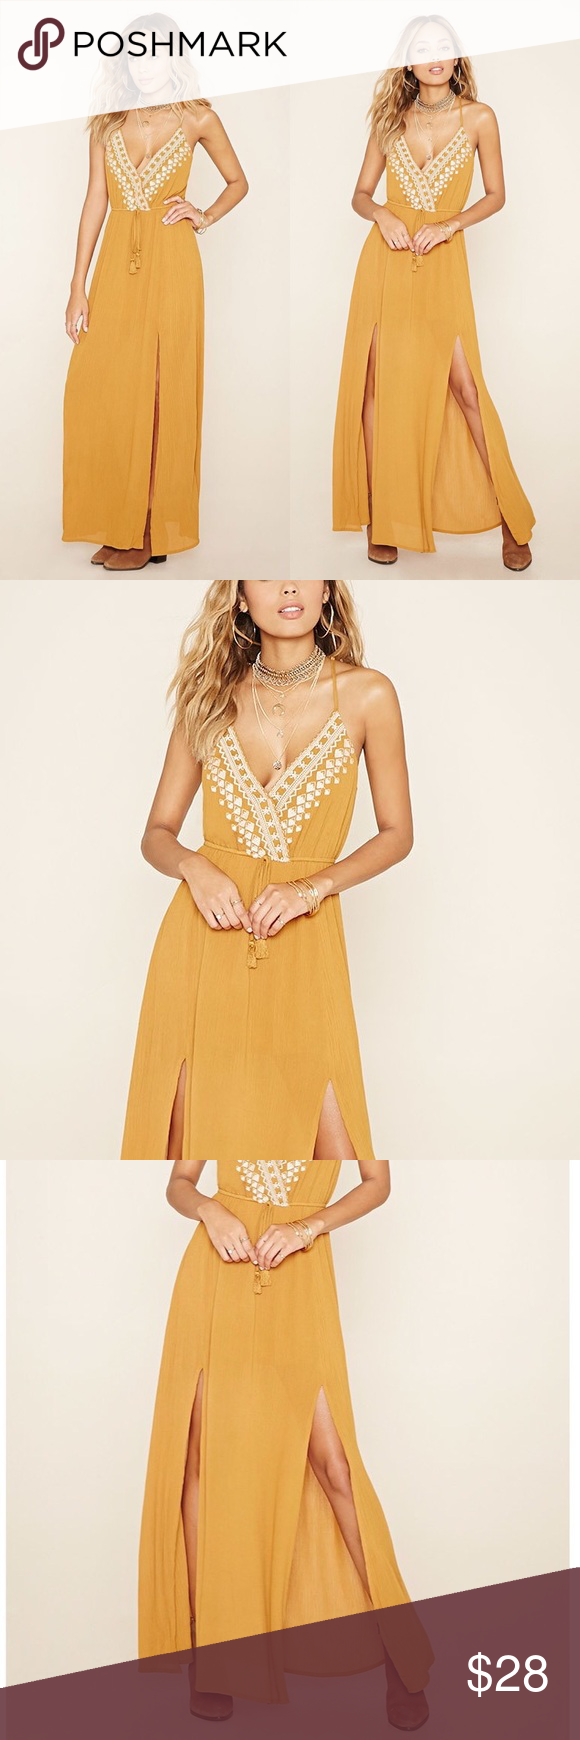 New forever yellow racerback mslit maxi dress my posh picks